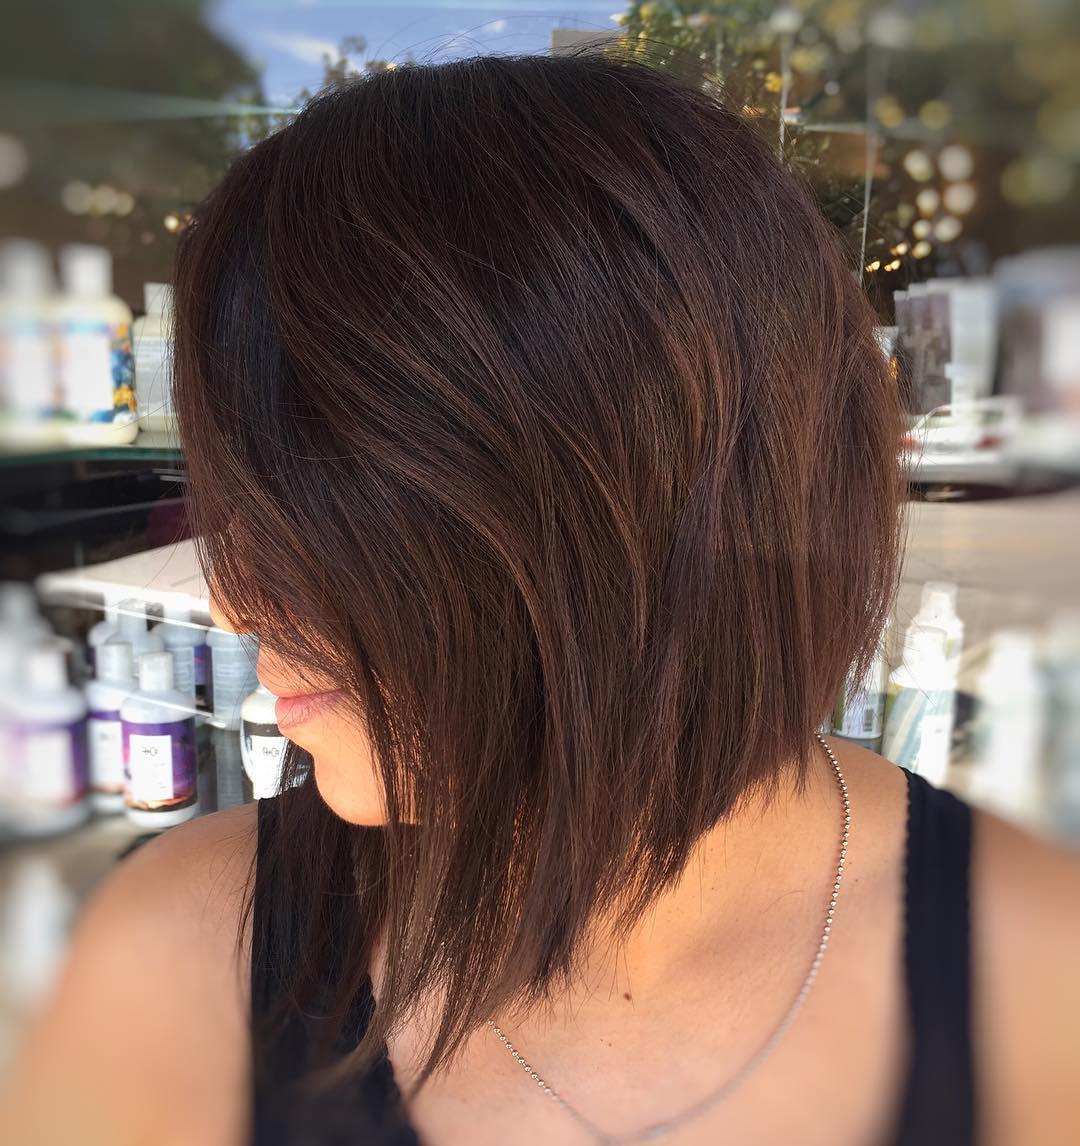 Bob Haircuts for Fine Hair, Long and Short Bob Hairstyles ...